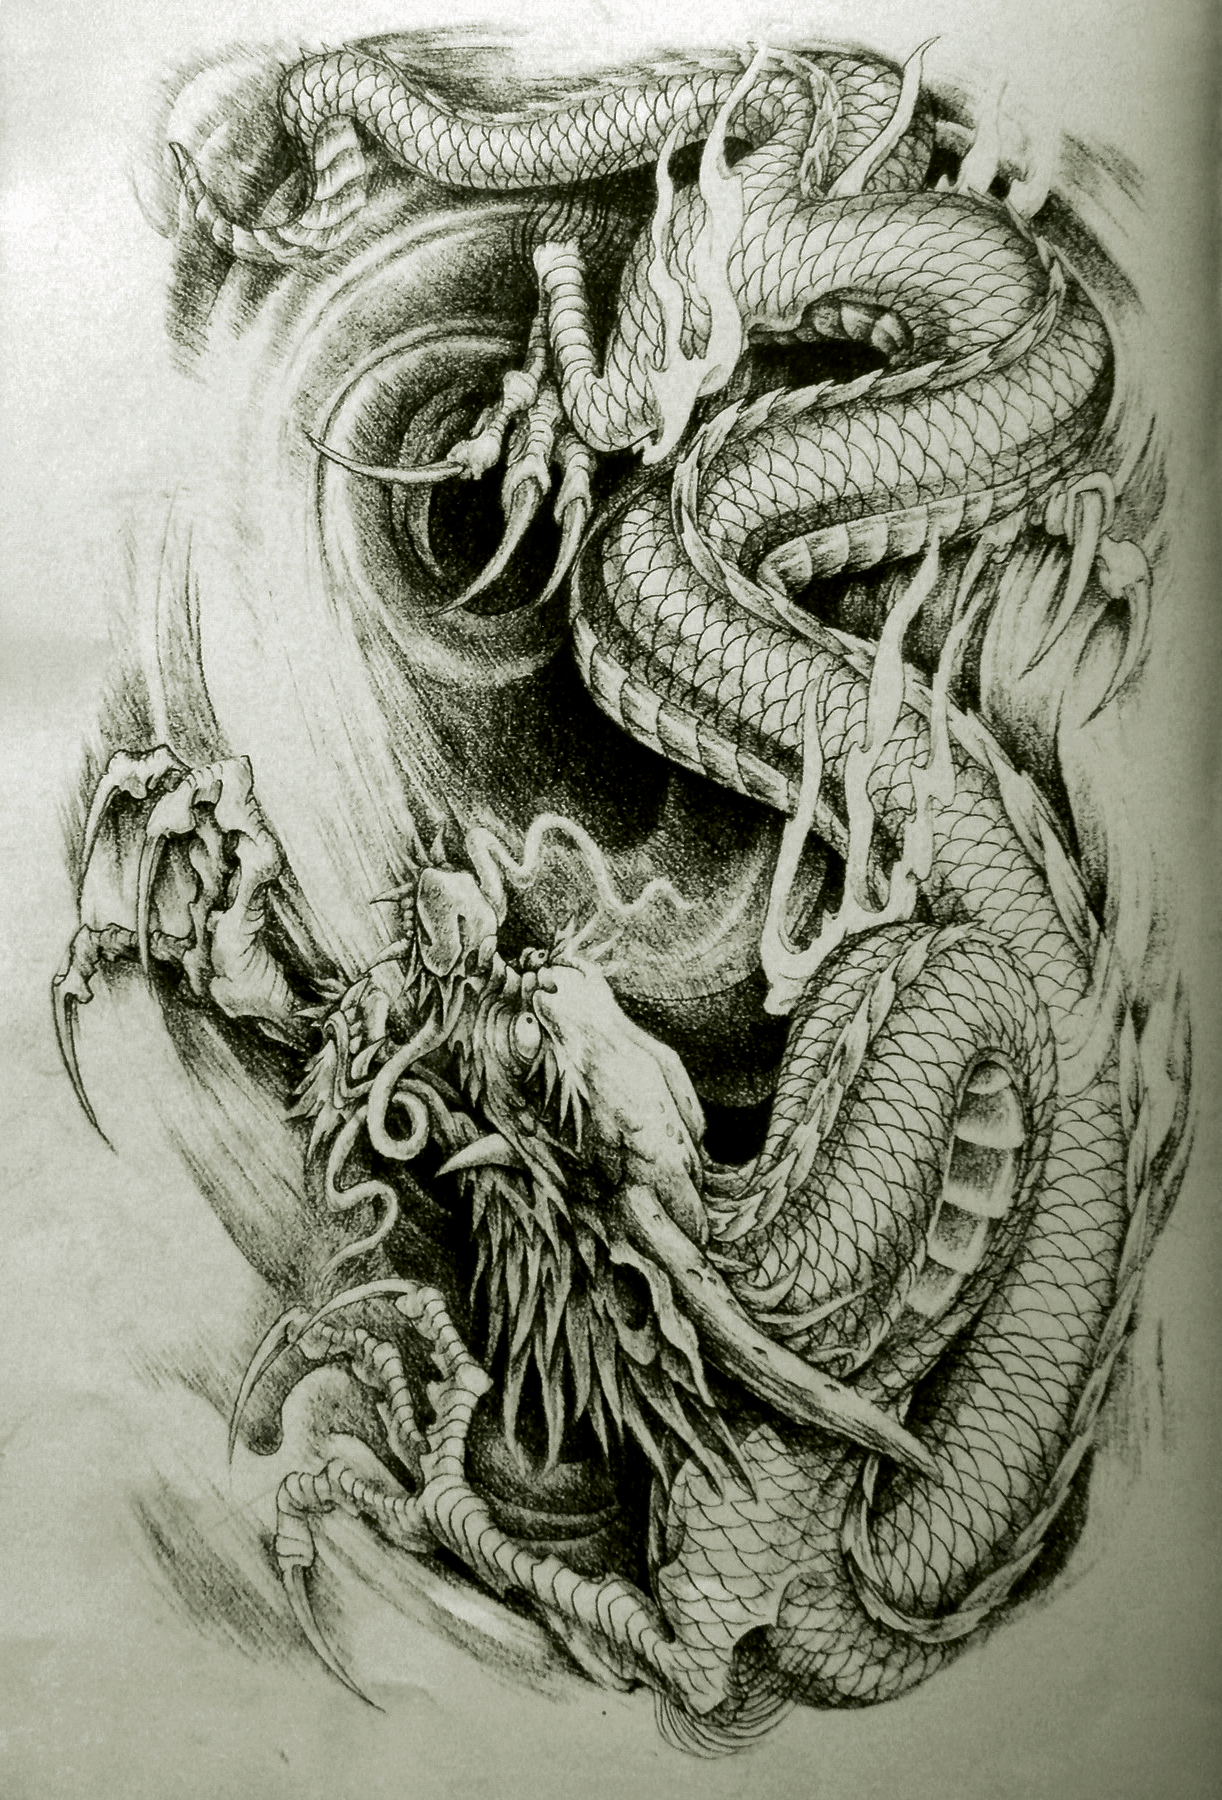 best dragon tattoo drachen dragon tattoos pinterest. Black Bedroom Furniture Sets. Home Design Ideas